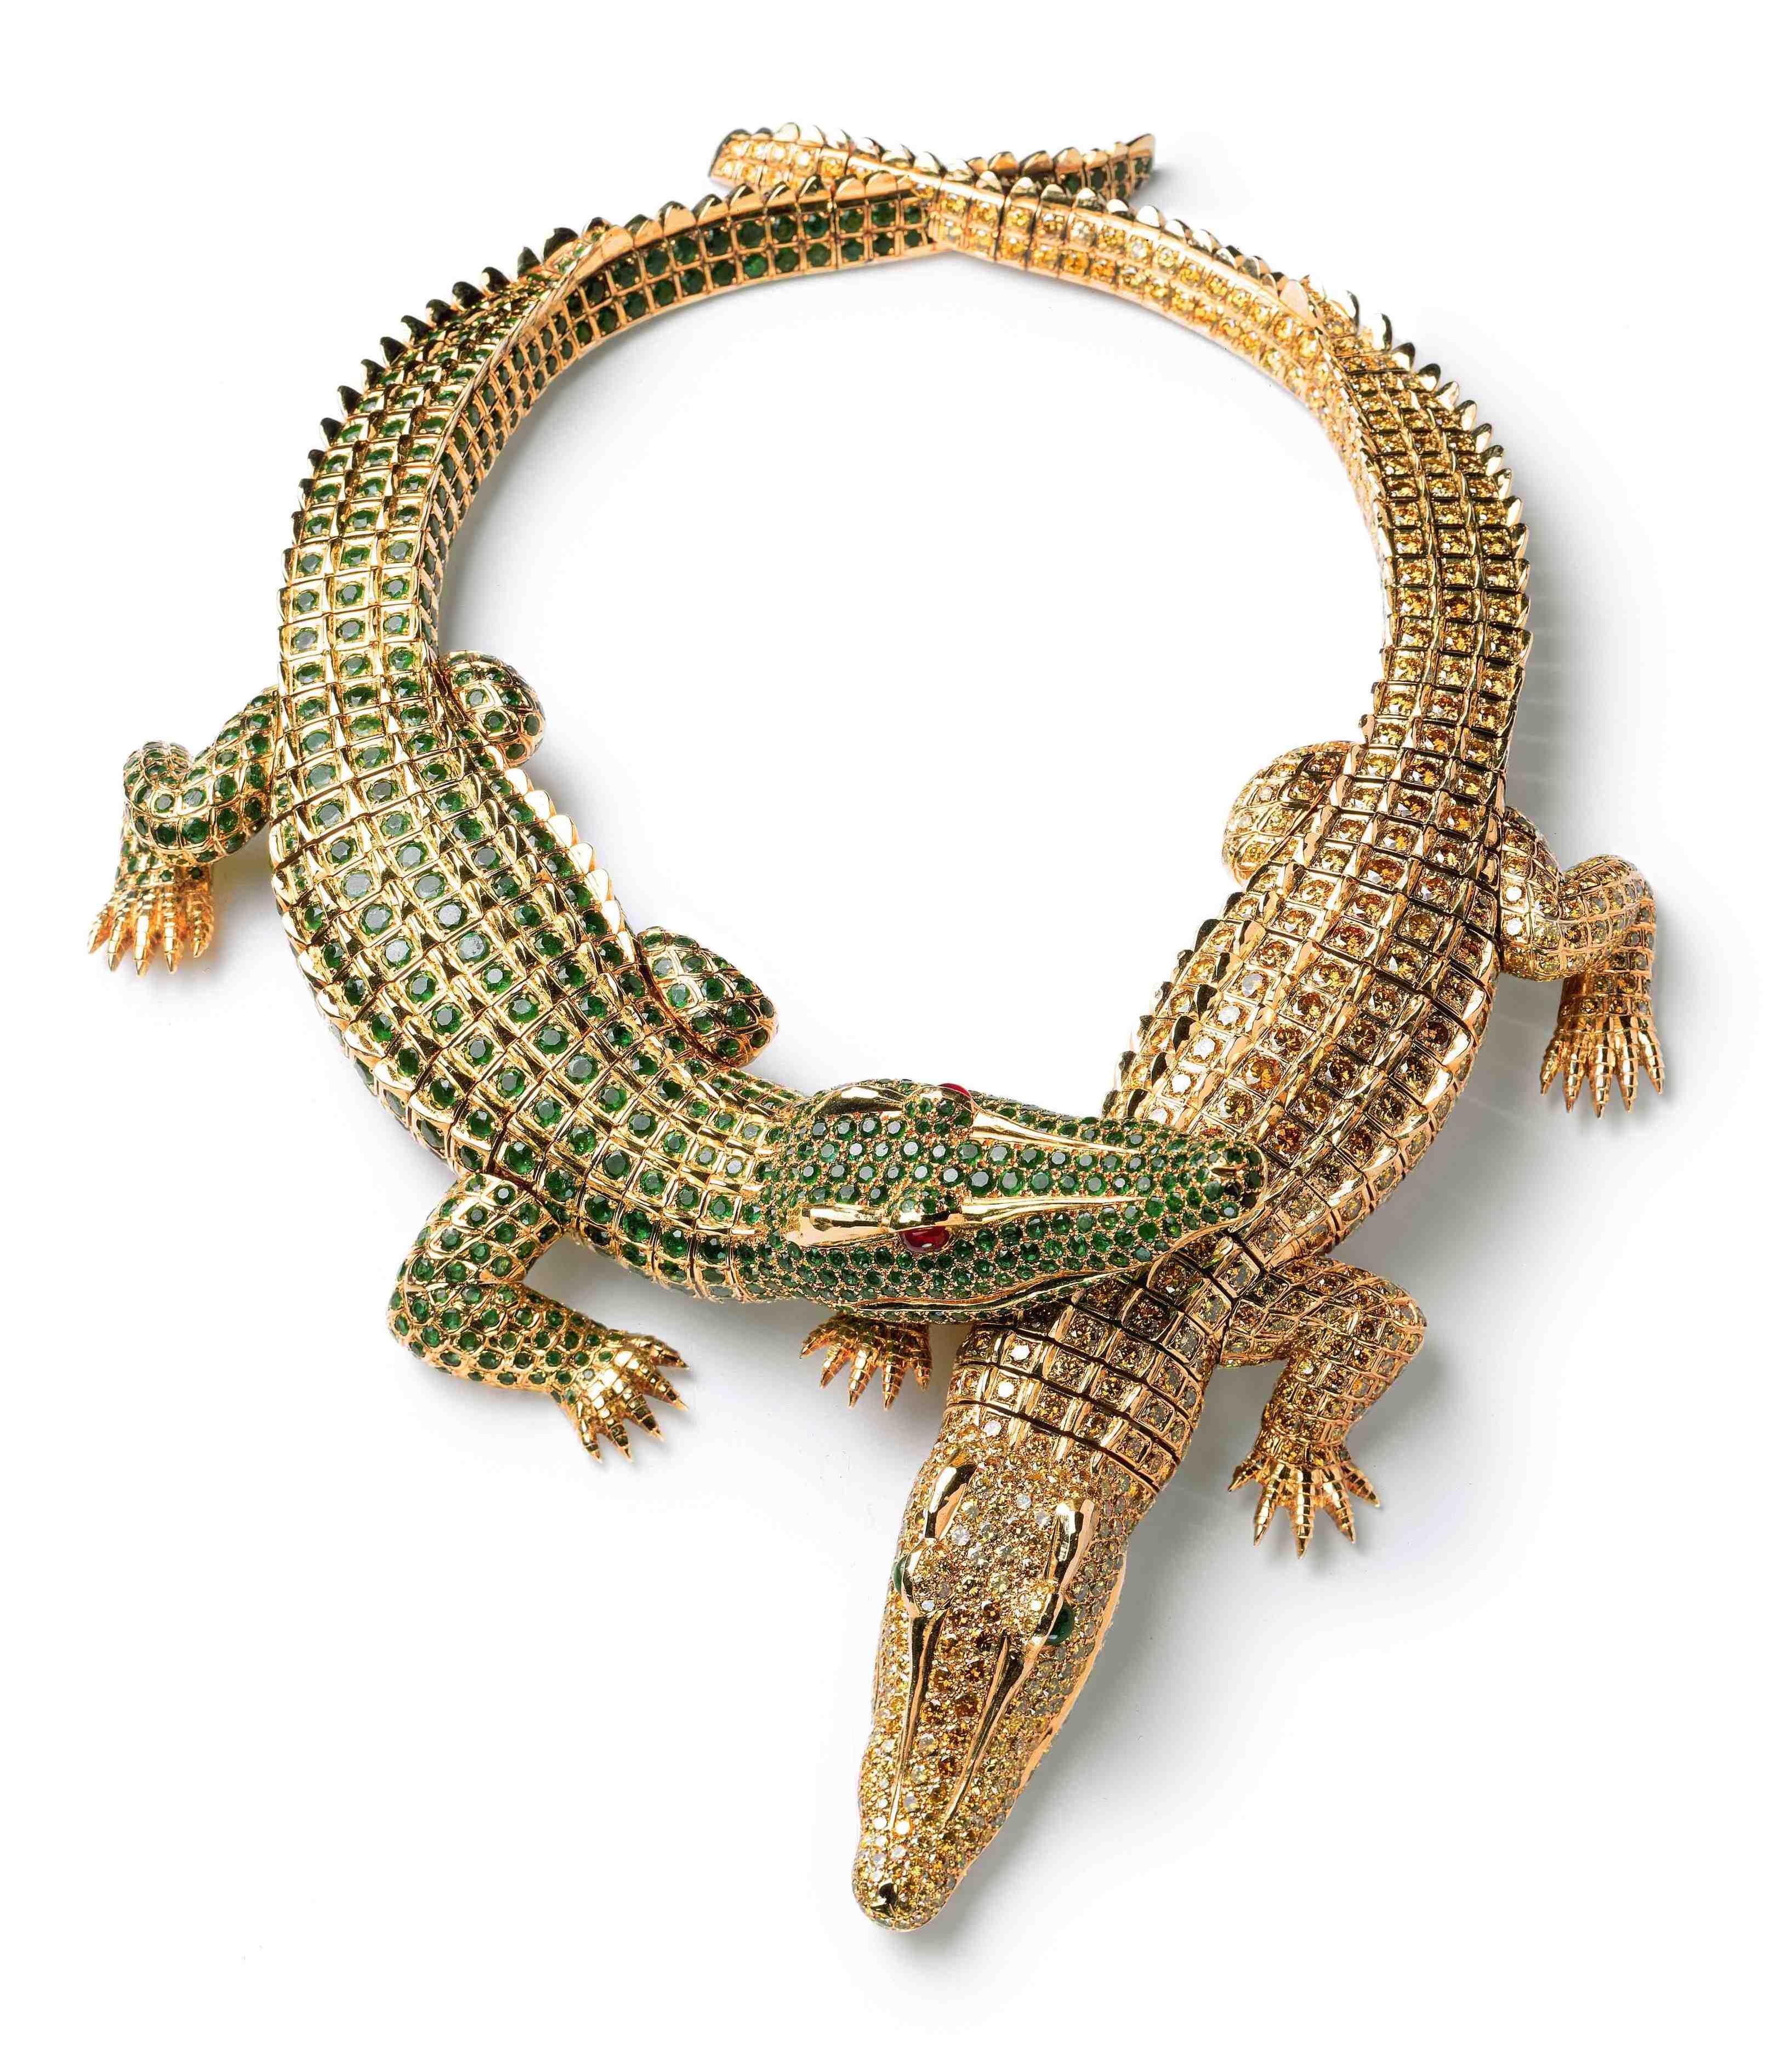 Cartier animal rings